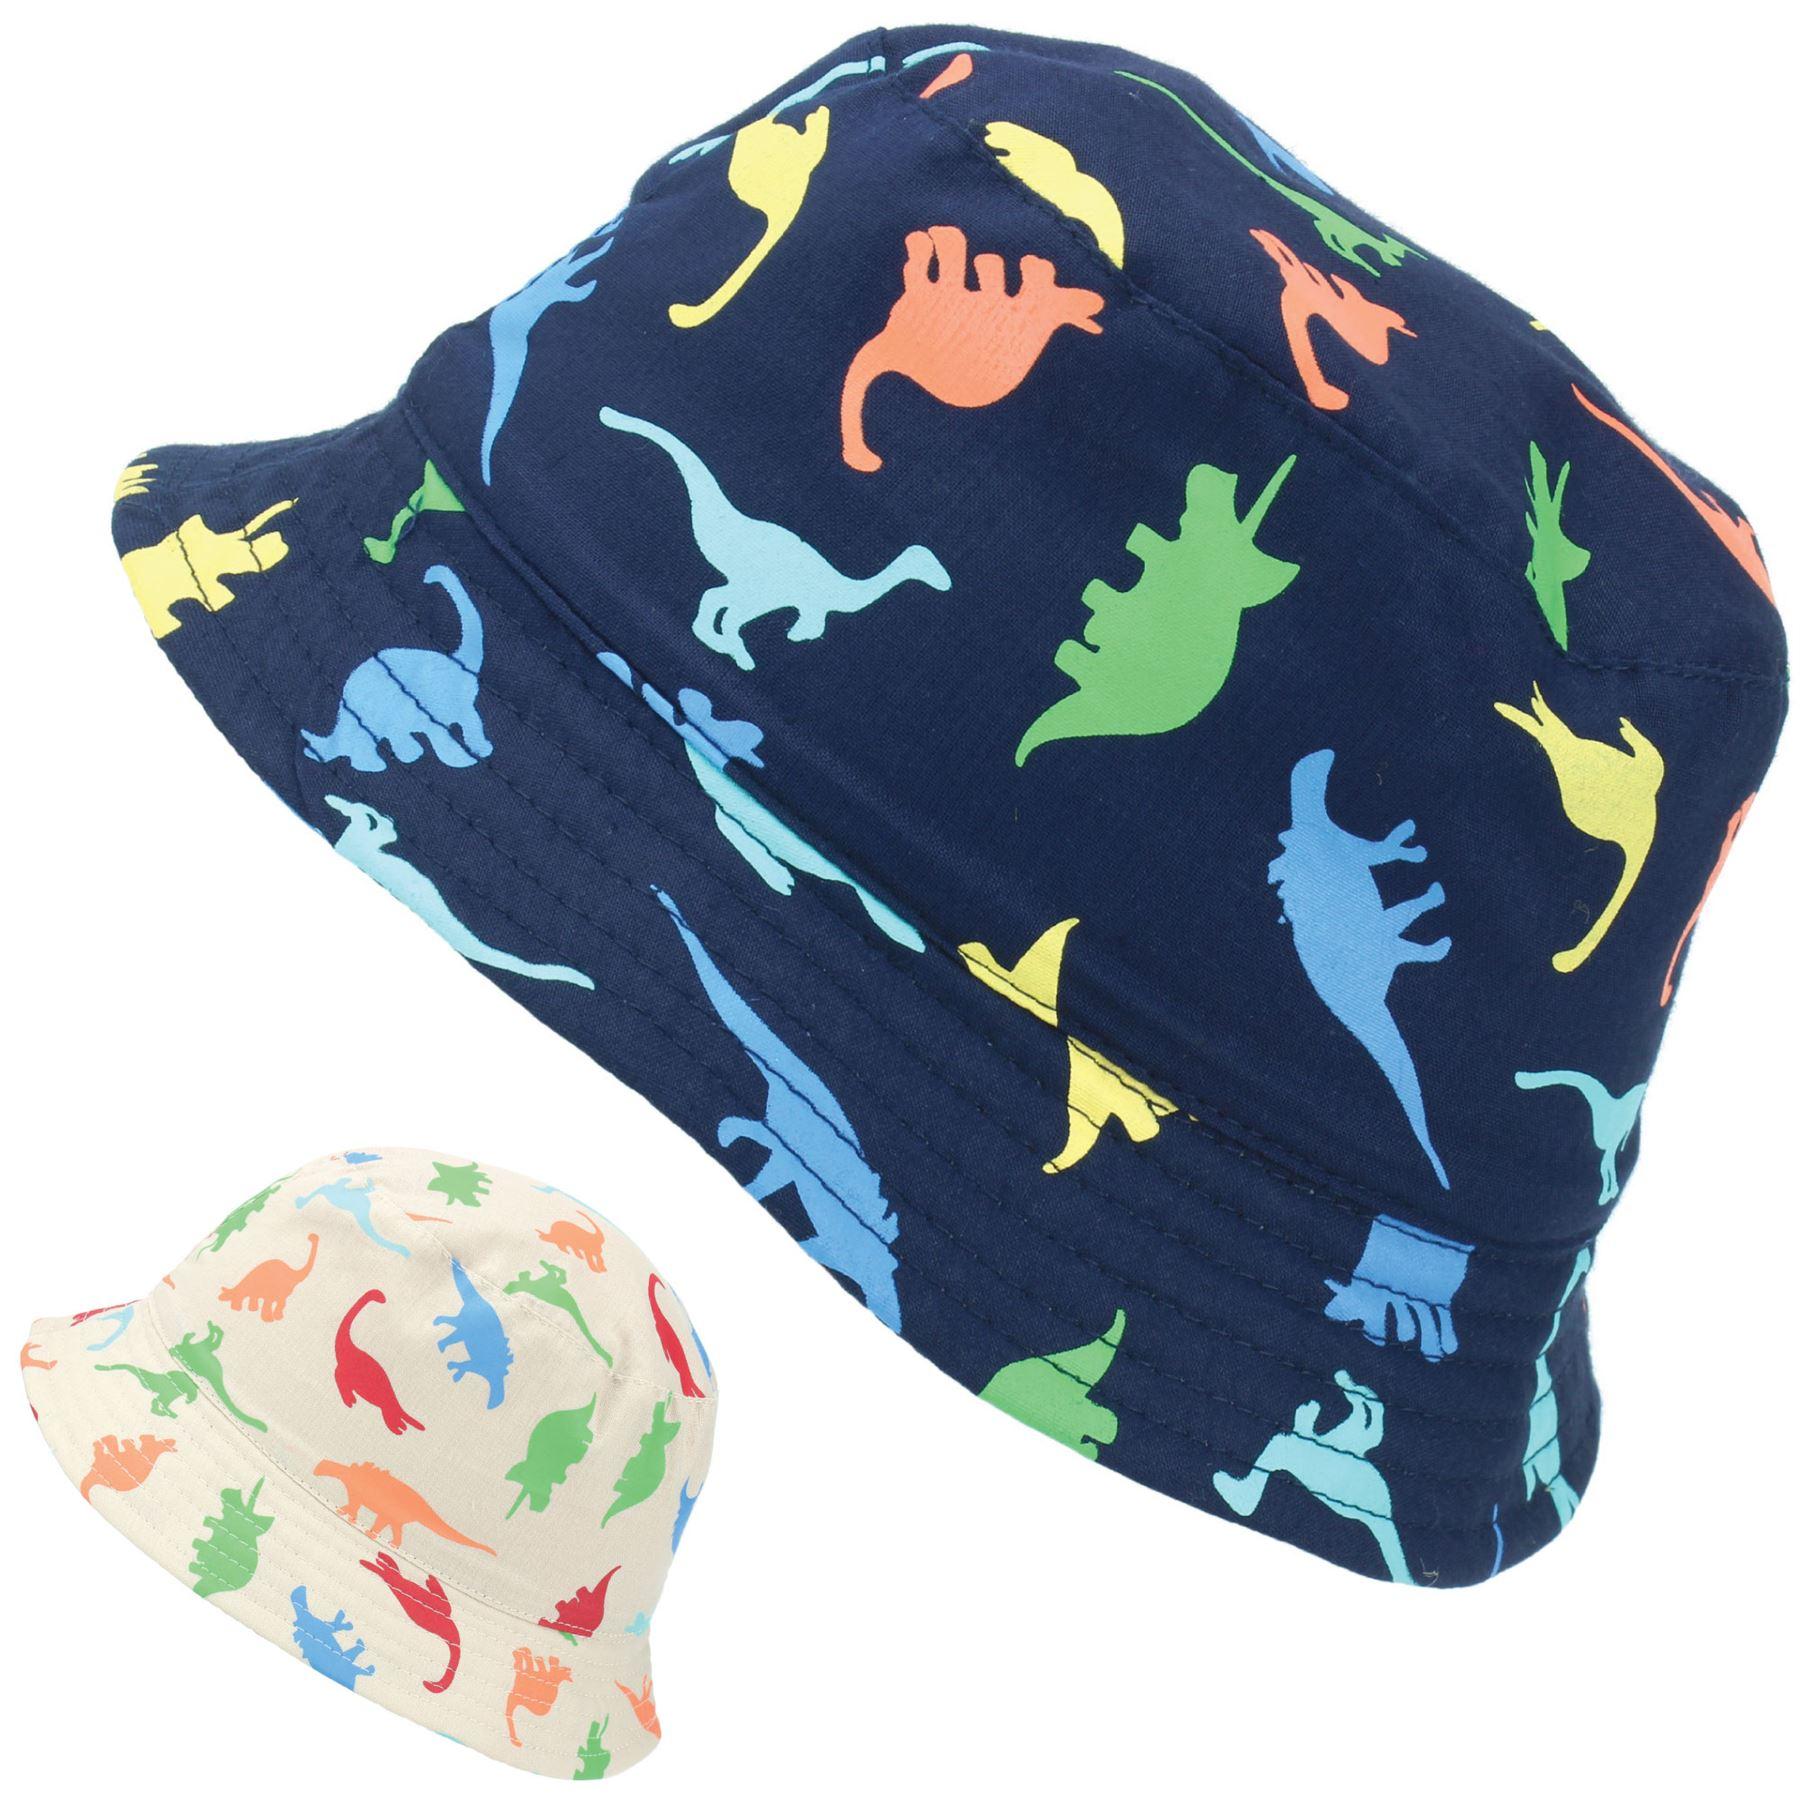 Details about Bucket Hat Sun Childrens Boys Girls Baby Dinosaurs Dino Kids  Cap Summer 71853440d404